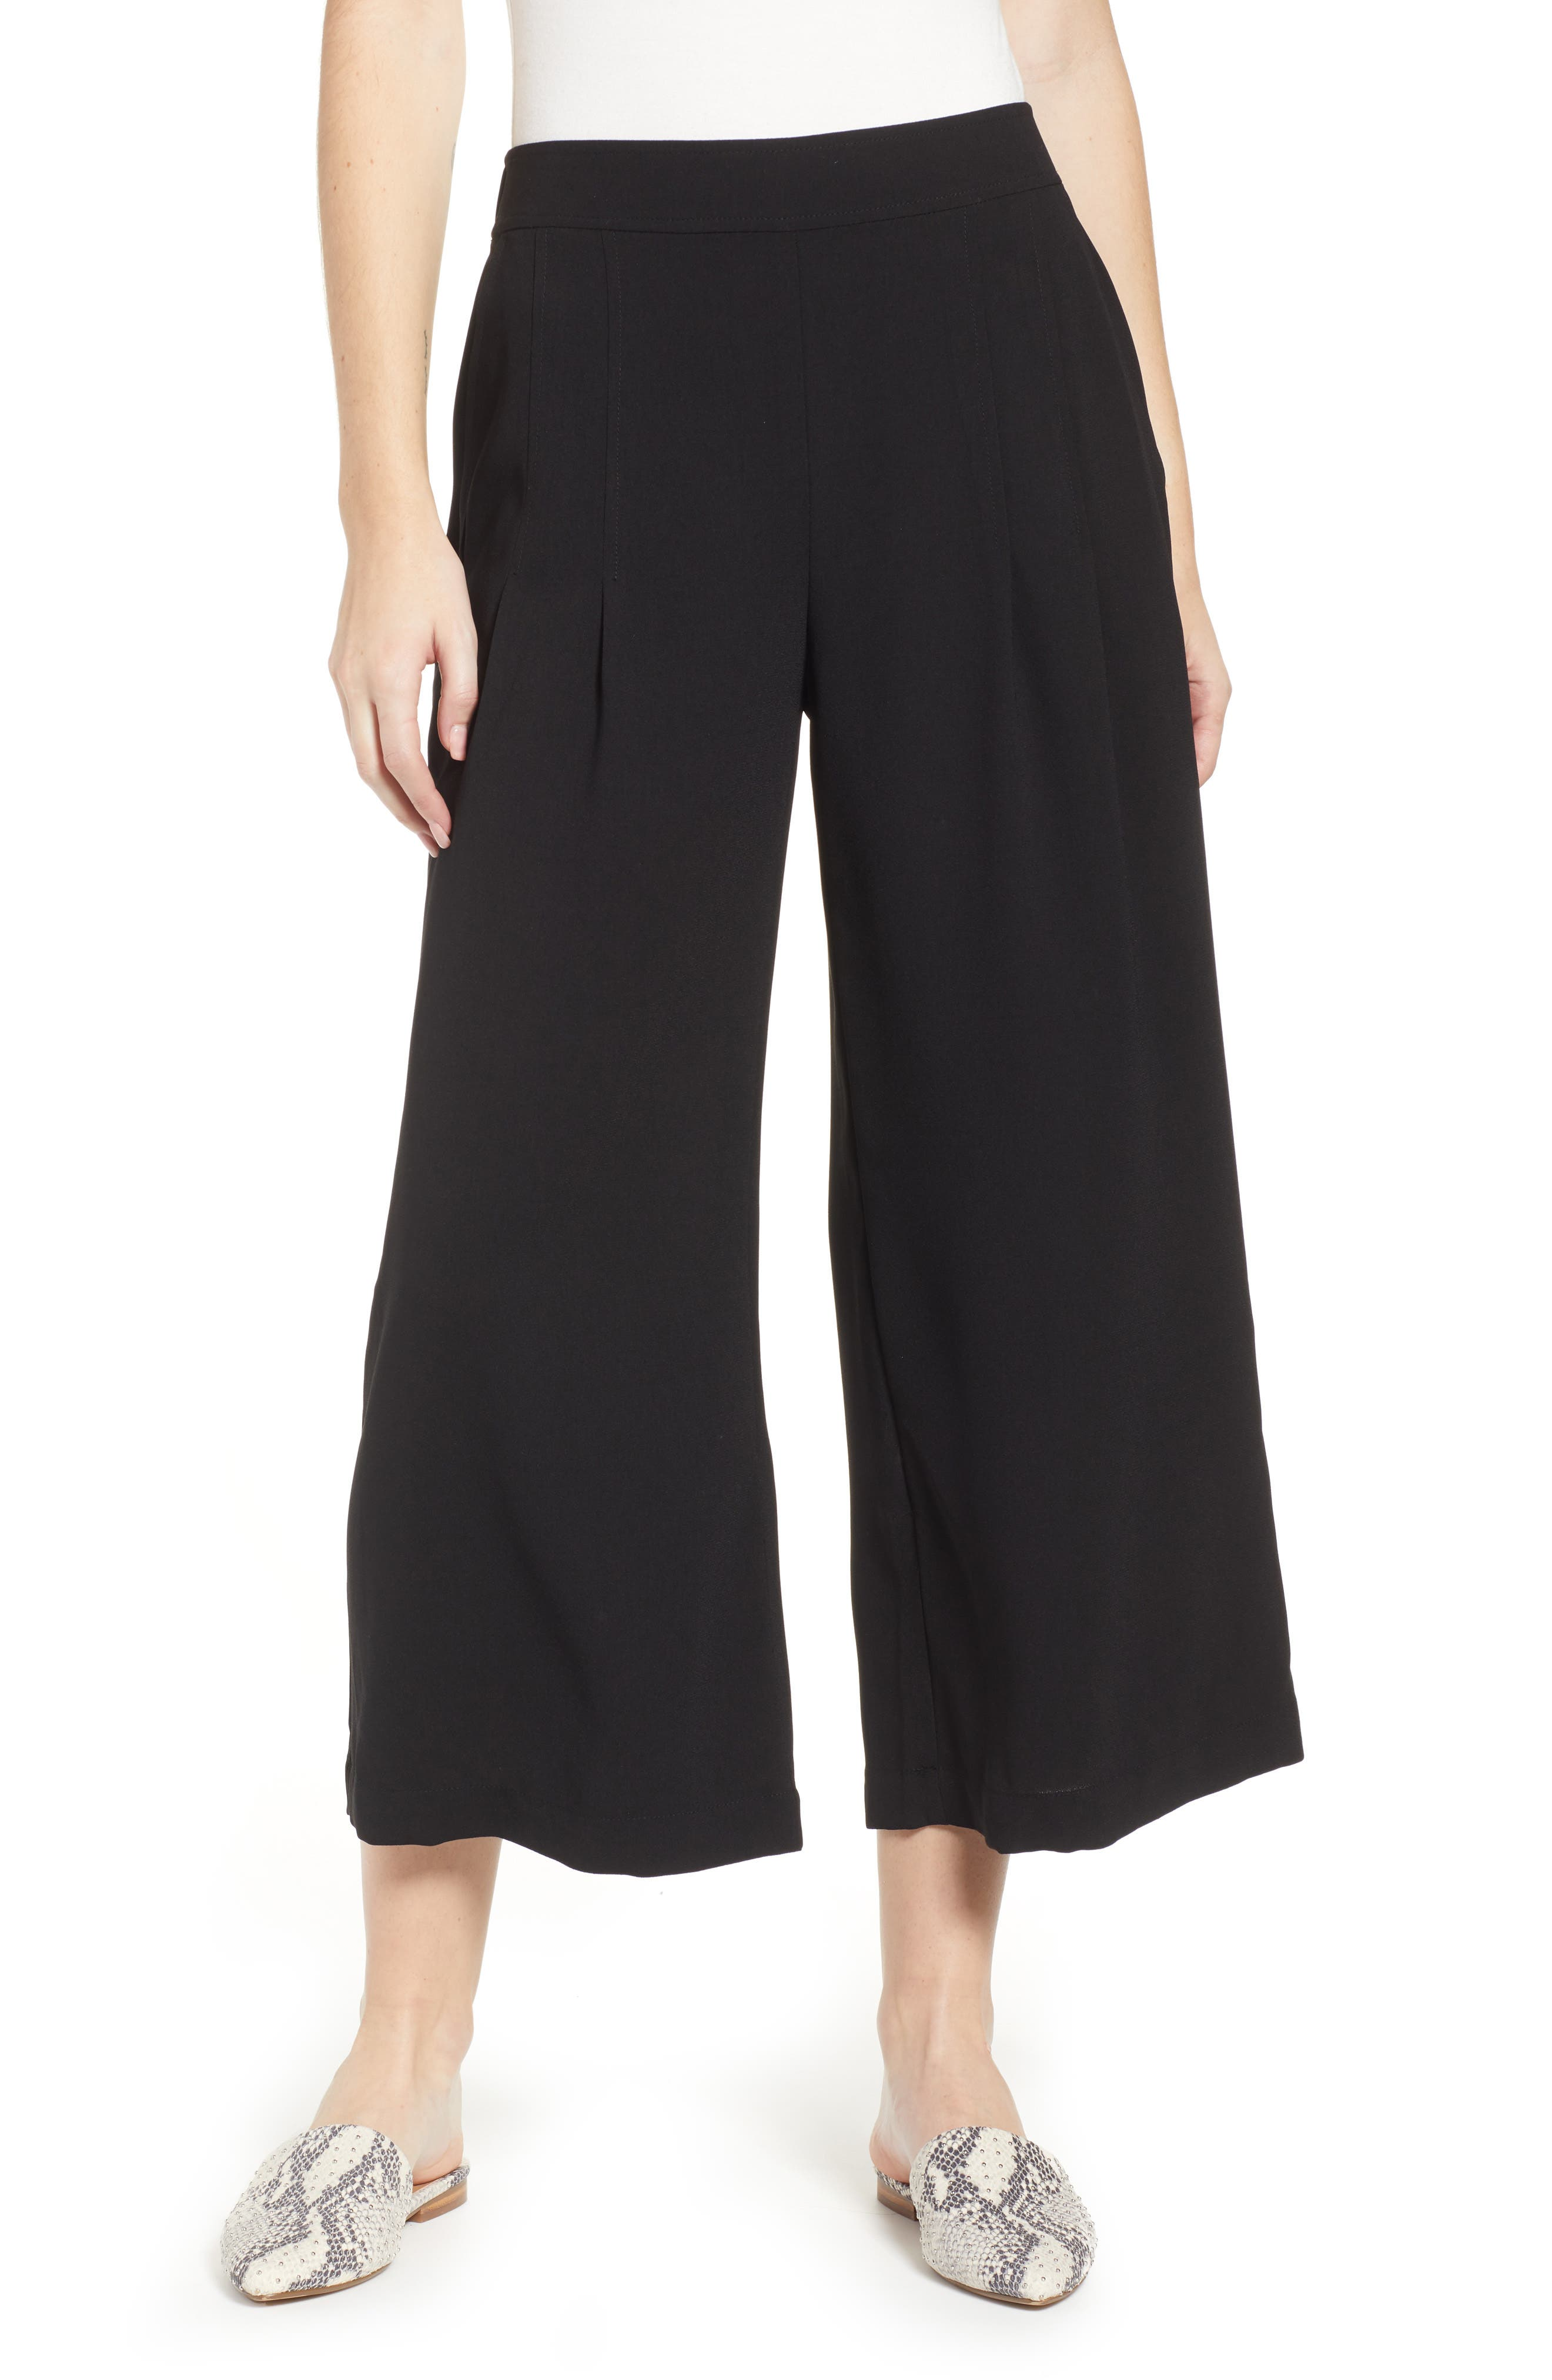 BP., High Waist Soft Wide Leg Crop Pants, Main thumbnail 1, color, BLACK